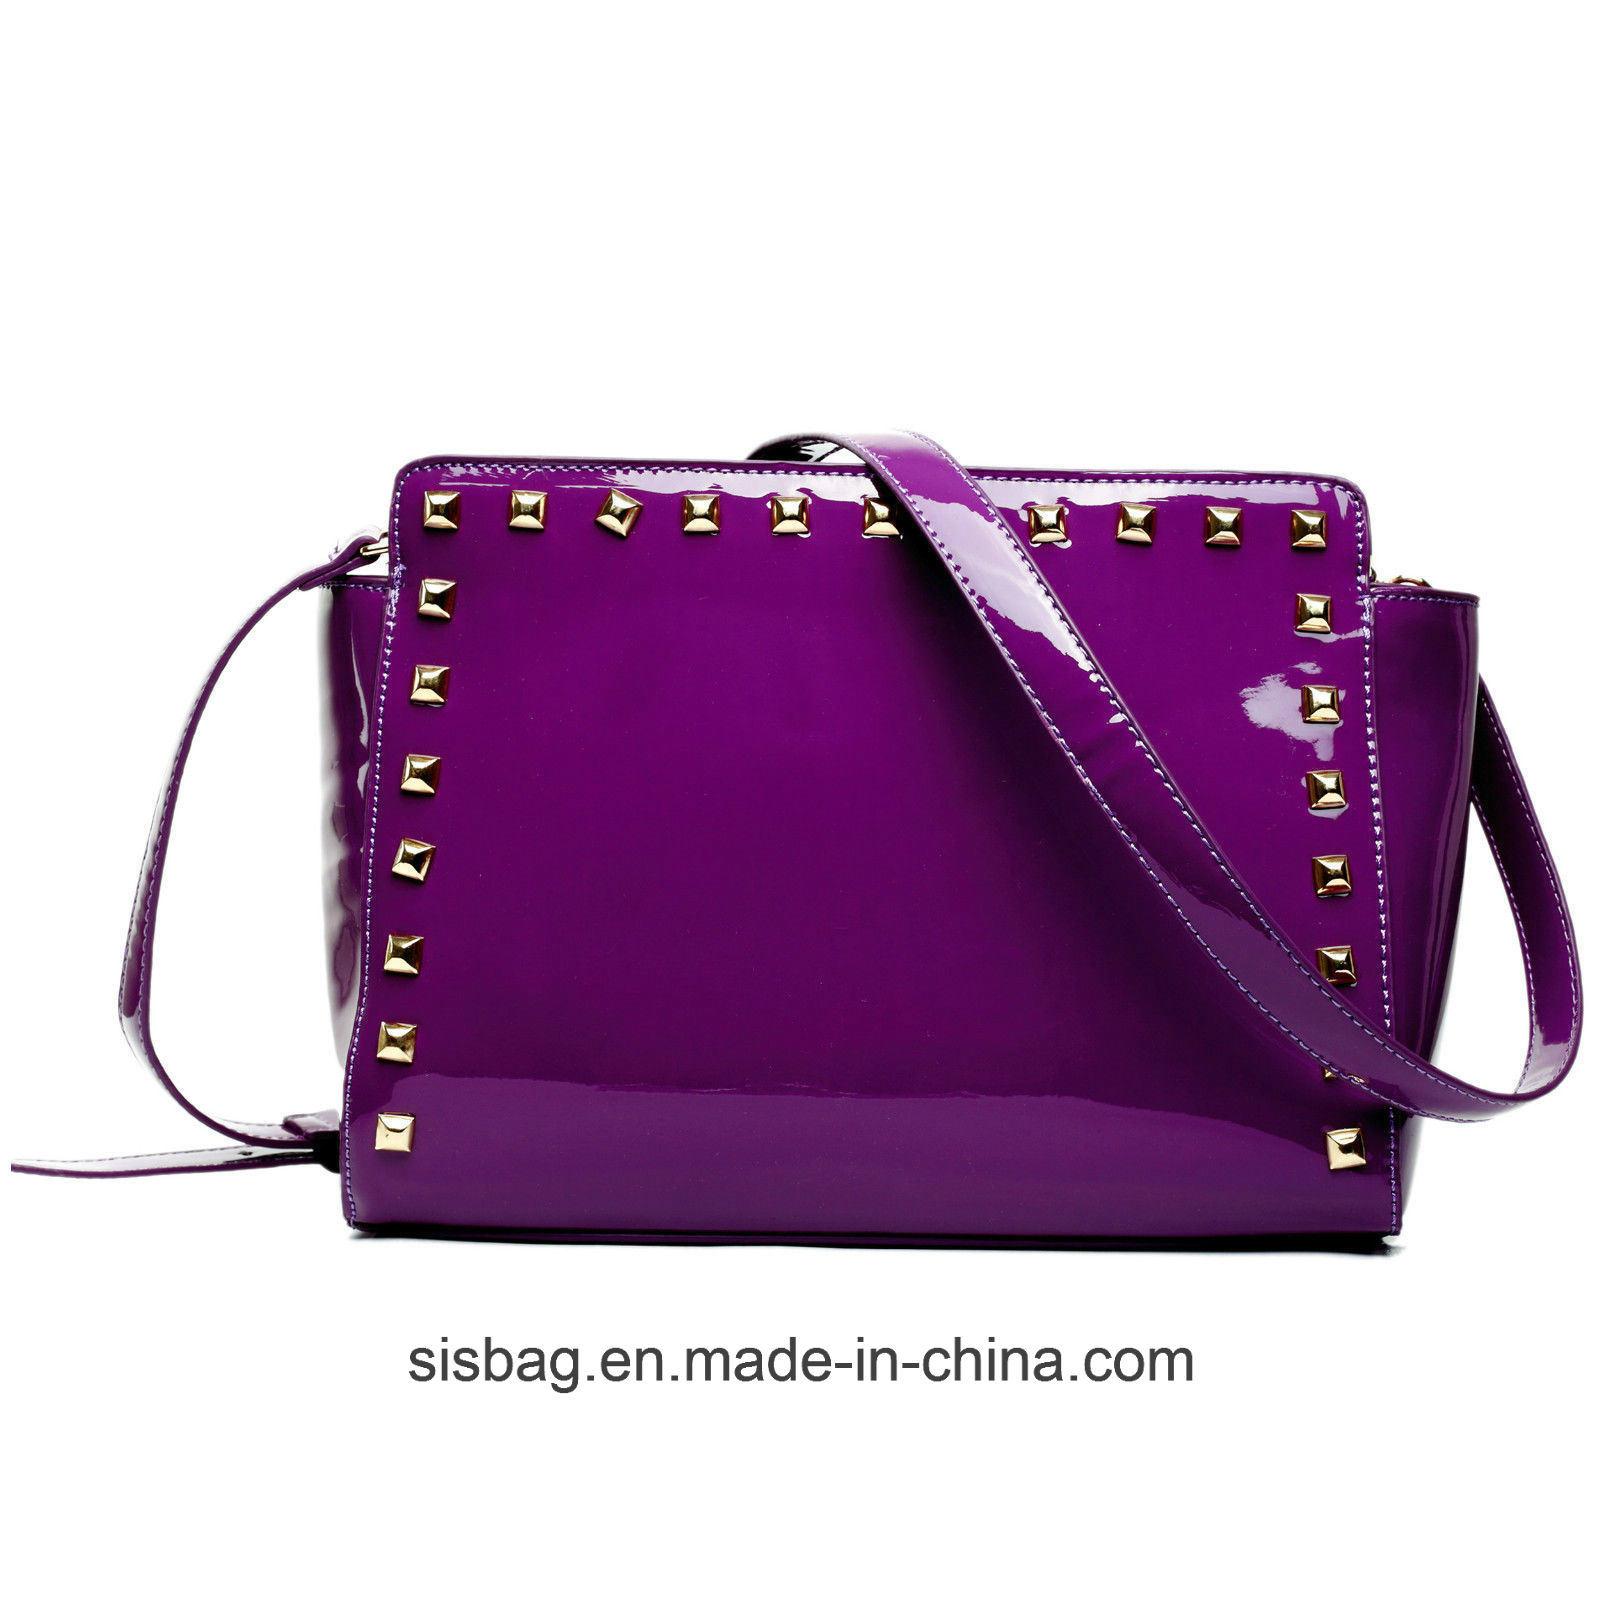 Womens Mirro PU Patent Bag Studded Cross Body Bag Shoulder Bag